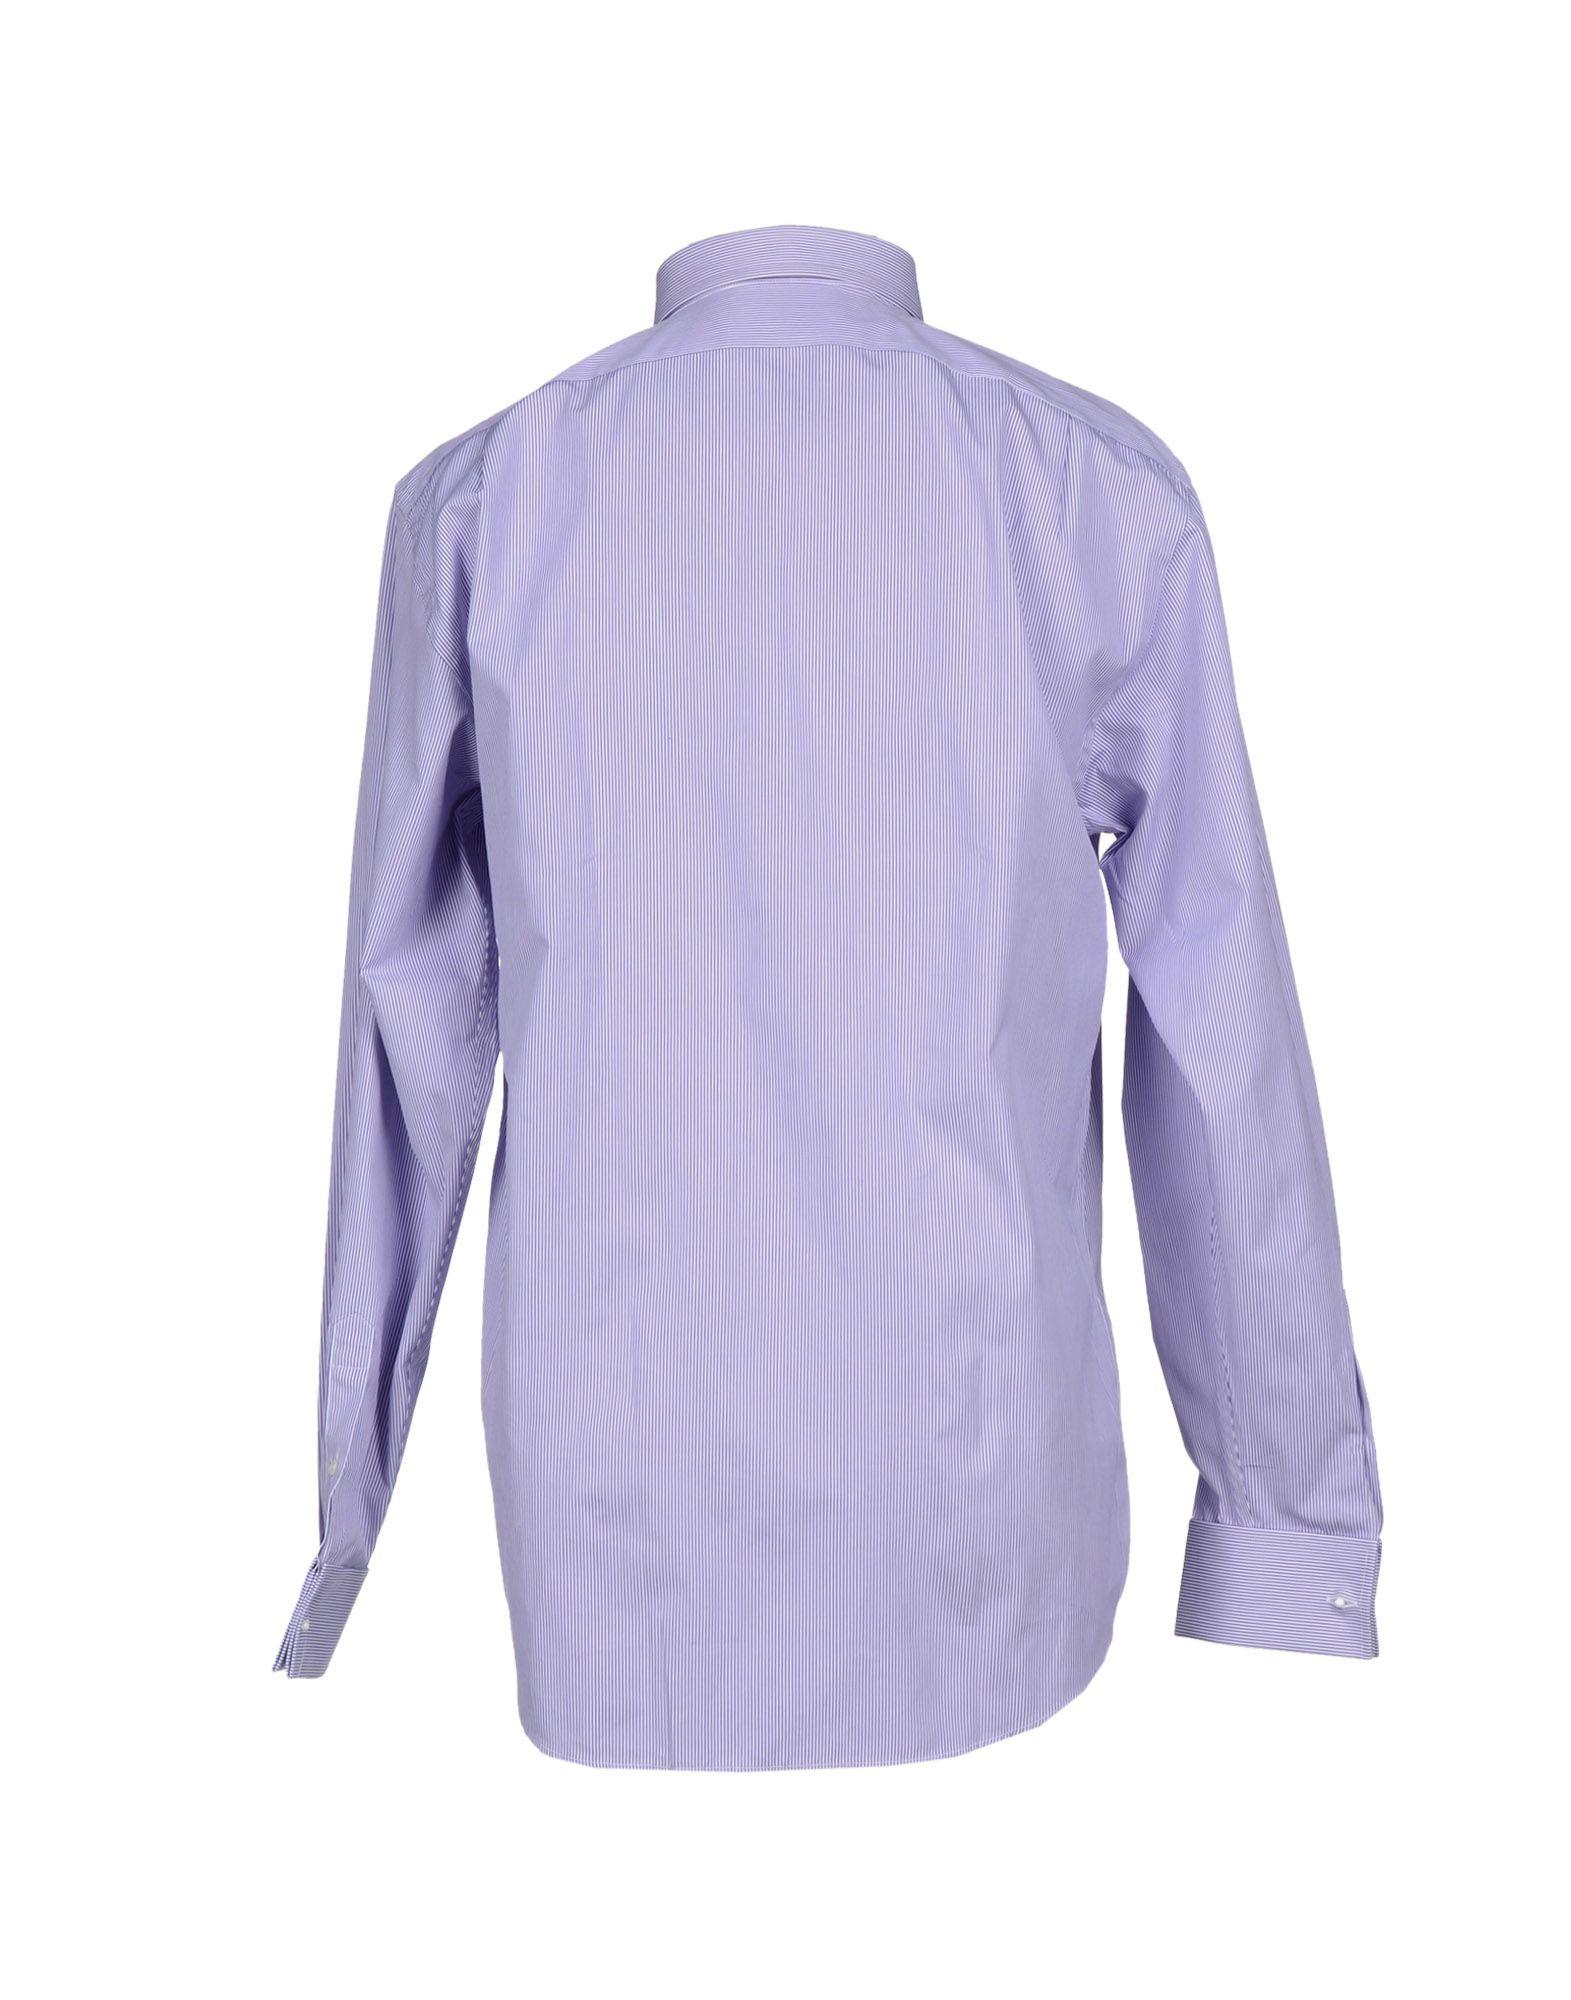 Lyst ralph lauren black label shirt in purple for men for Black ralph lauren shirt purple horse